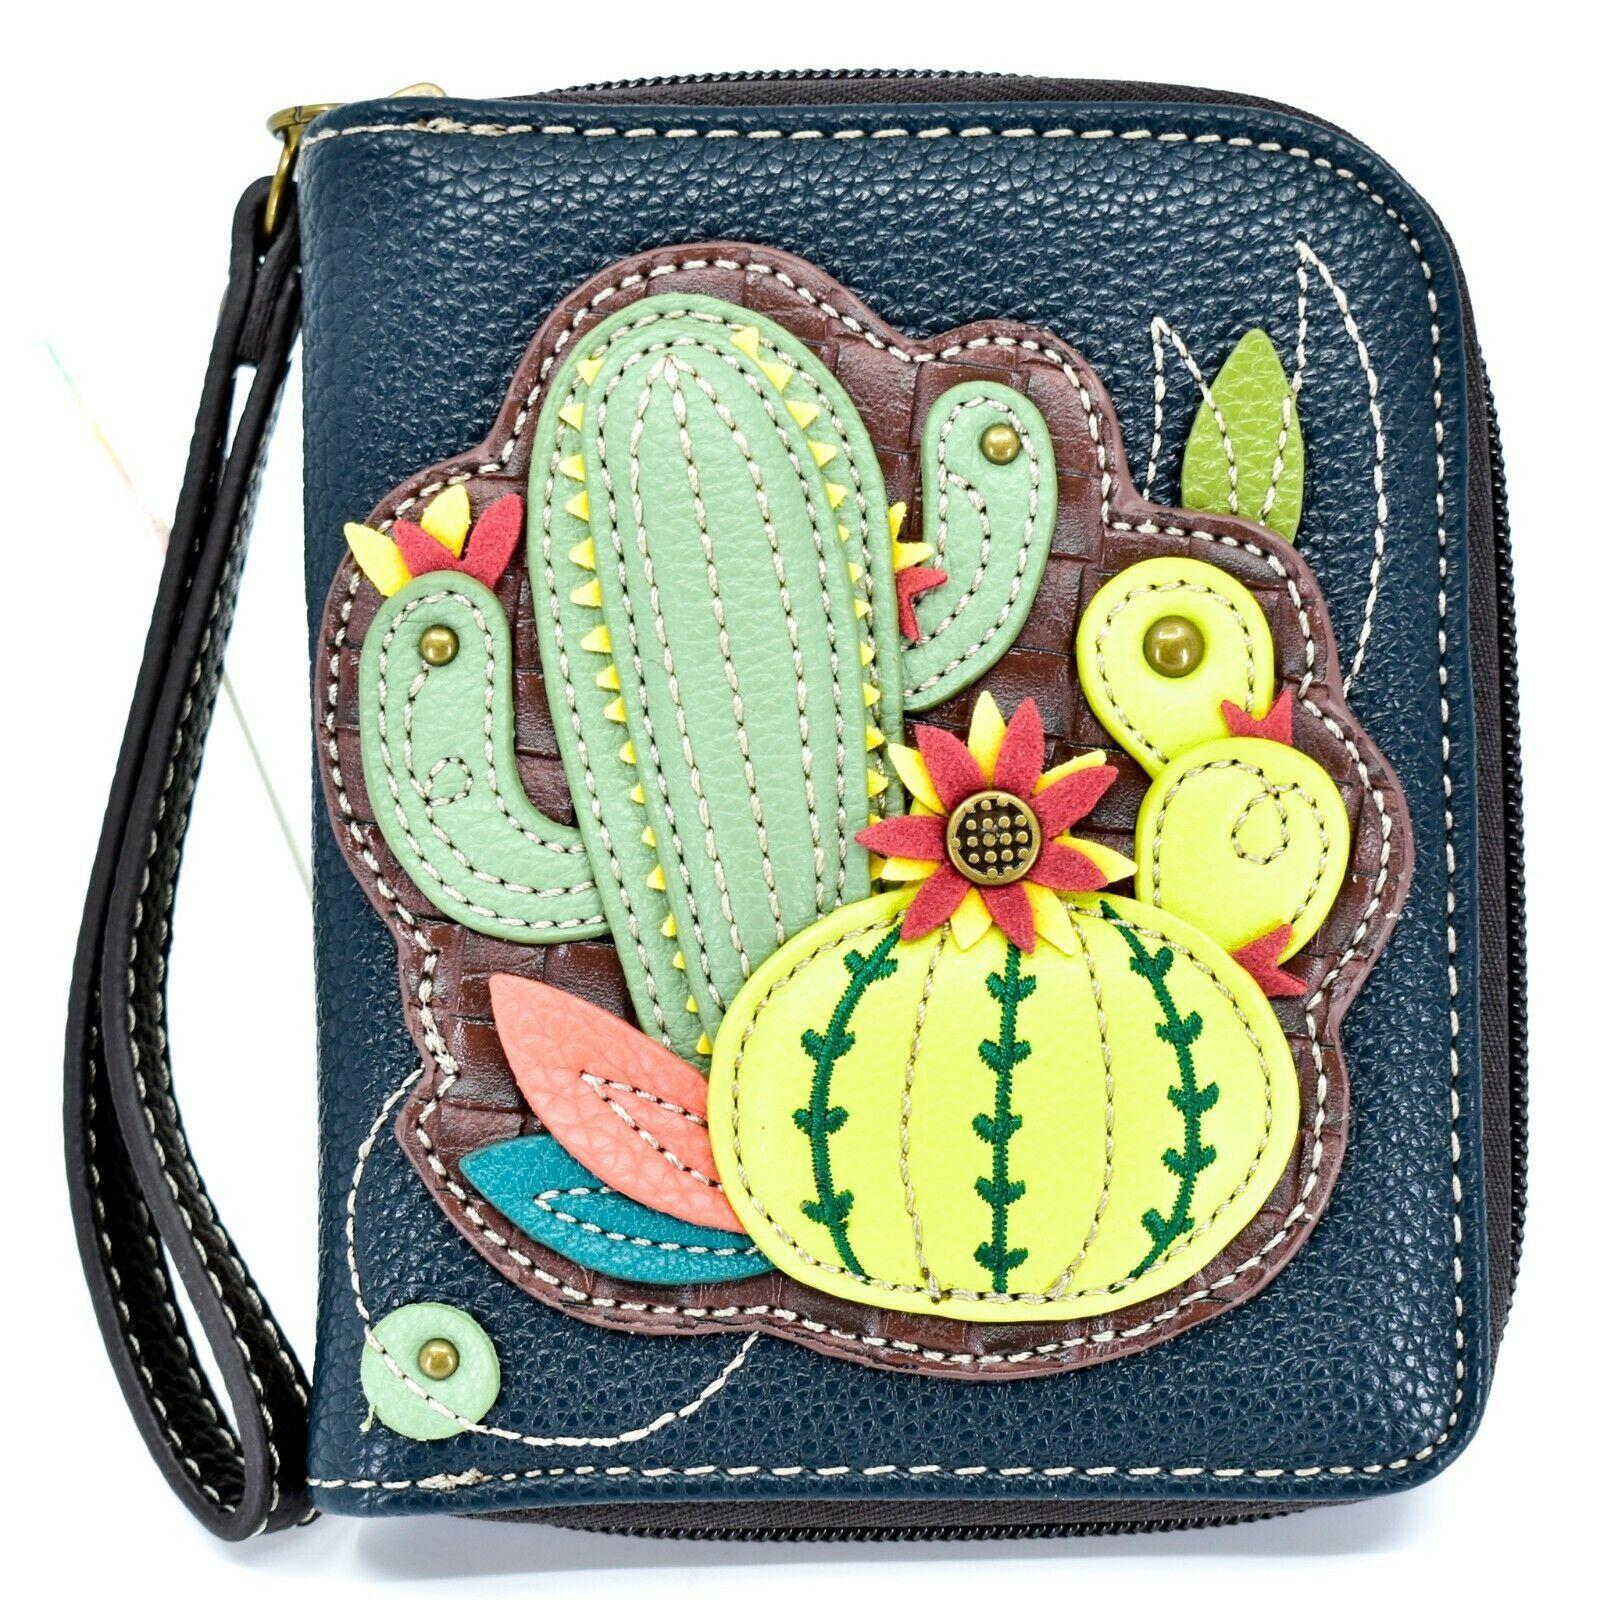 Chala Handbags Faux Leather Catcus Cacti Navy Zip Around Wristlet Wallet